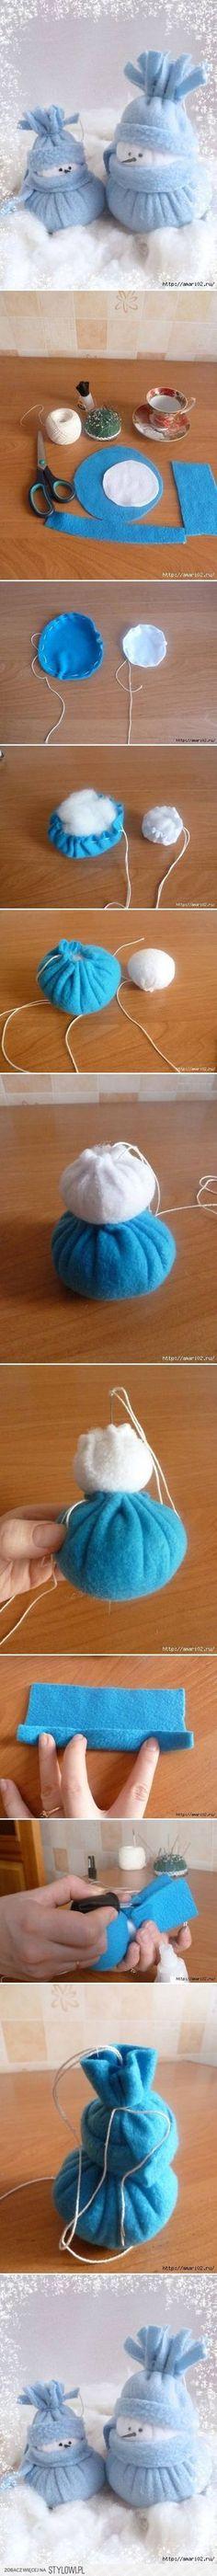 How to Make Felt Snowman Christmas holiday home decor